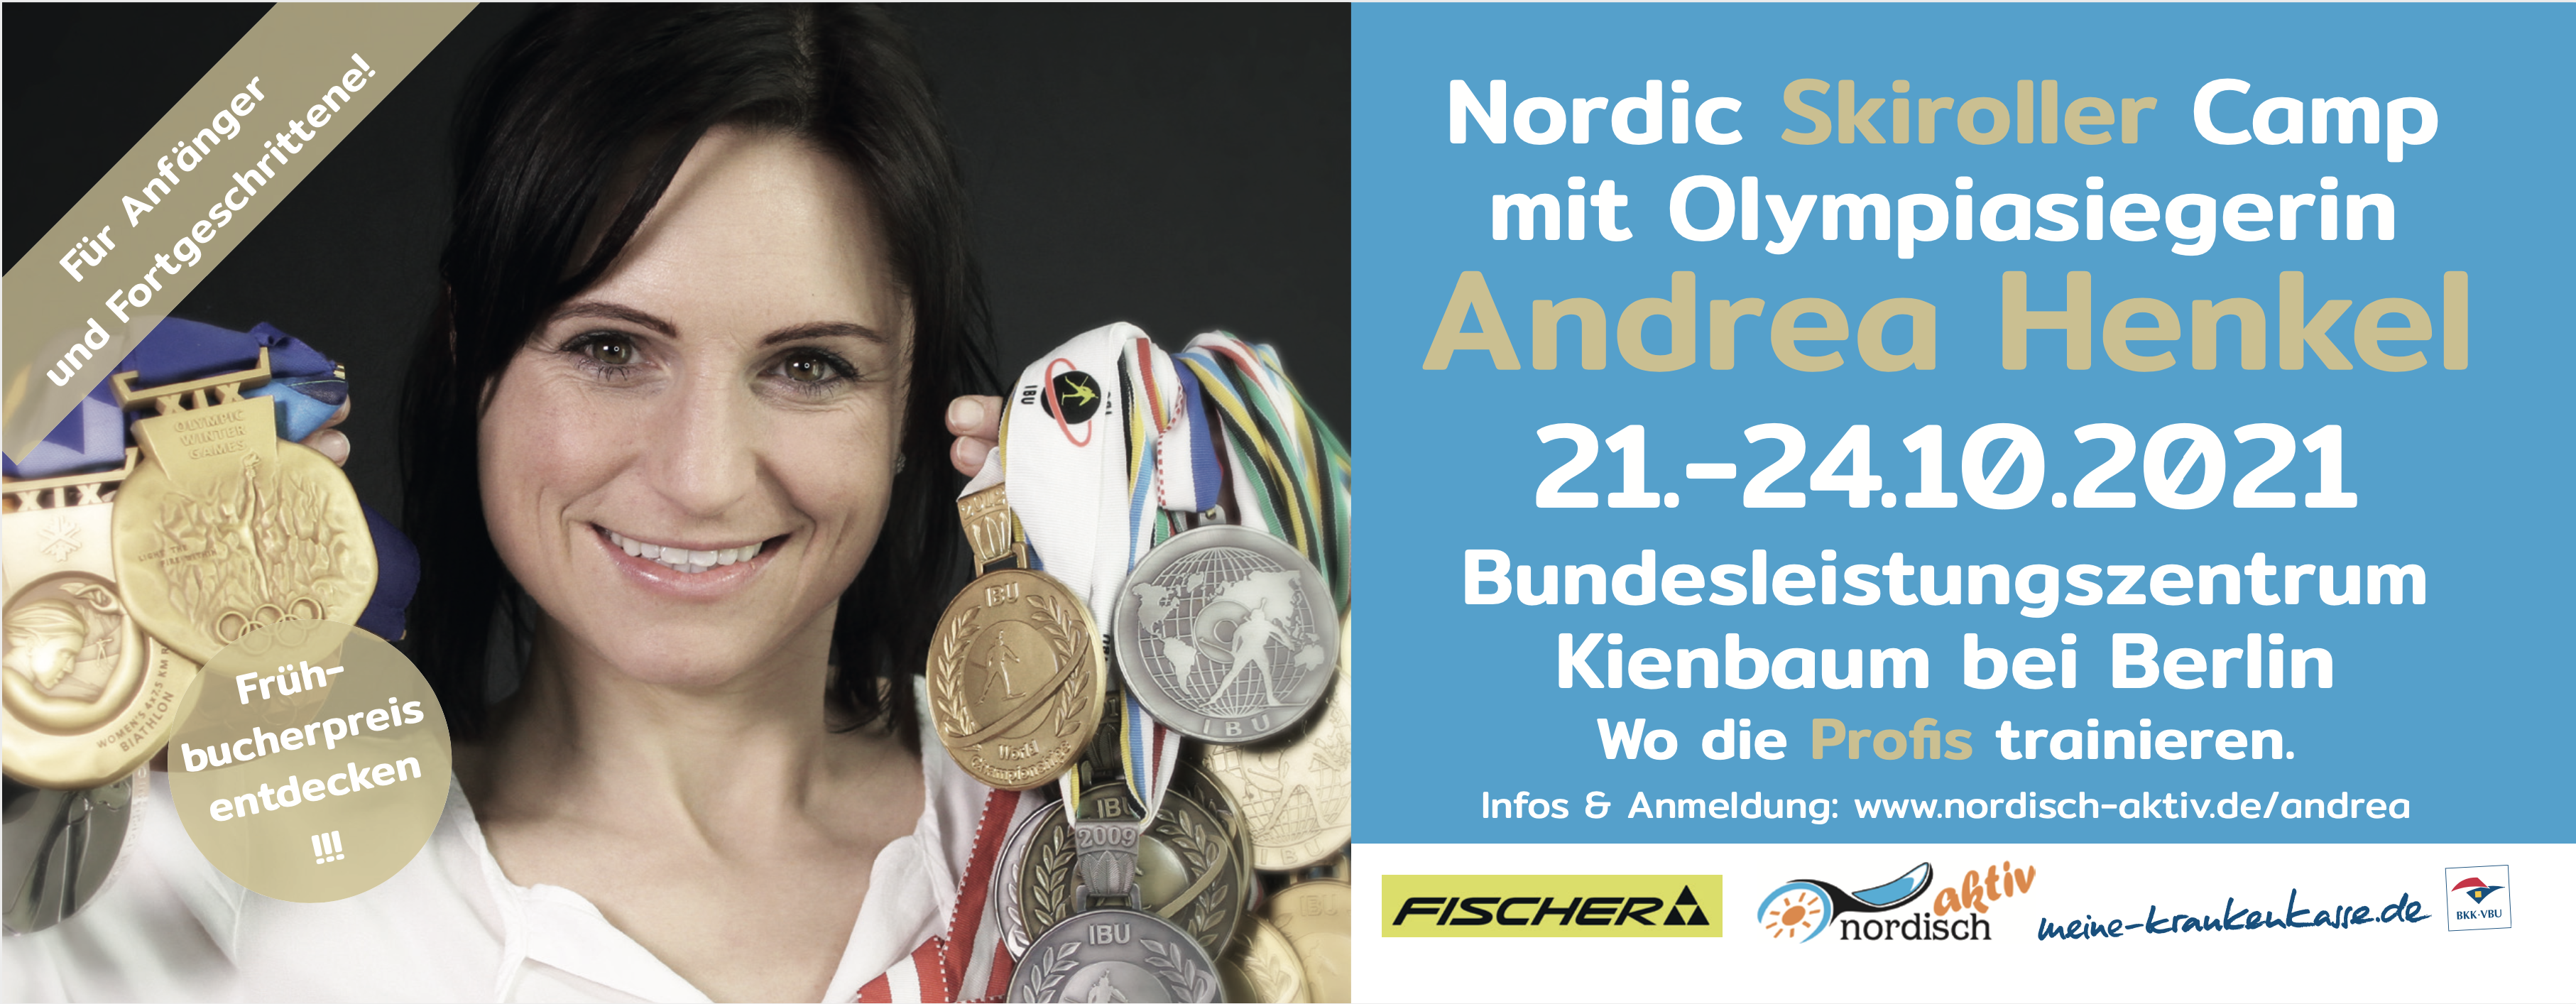 Andrea Henkel nordisch aktiv